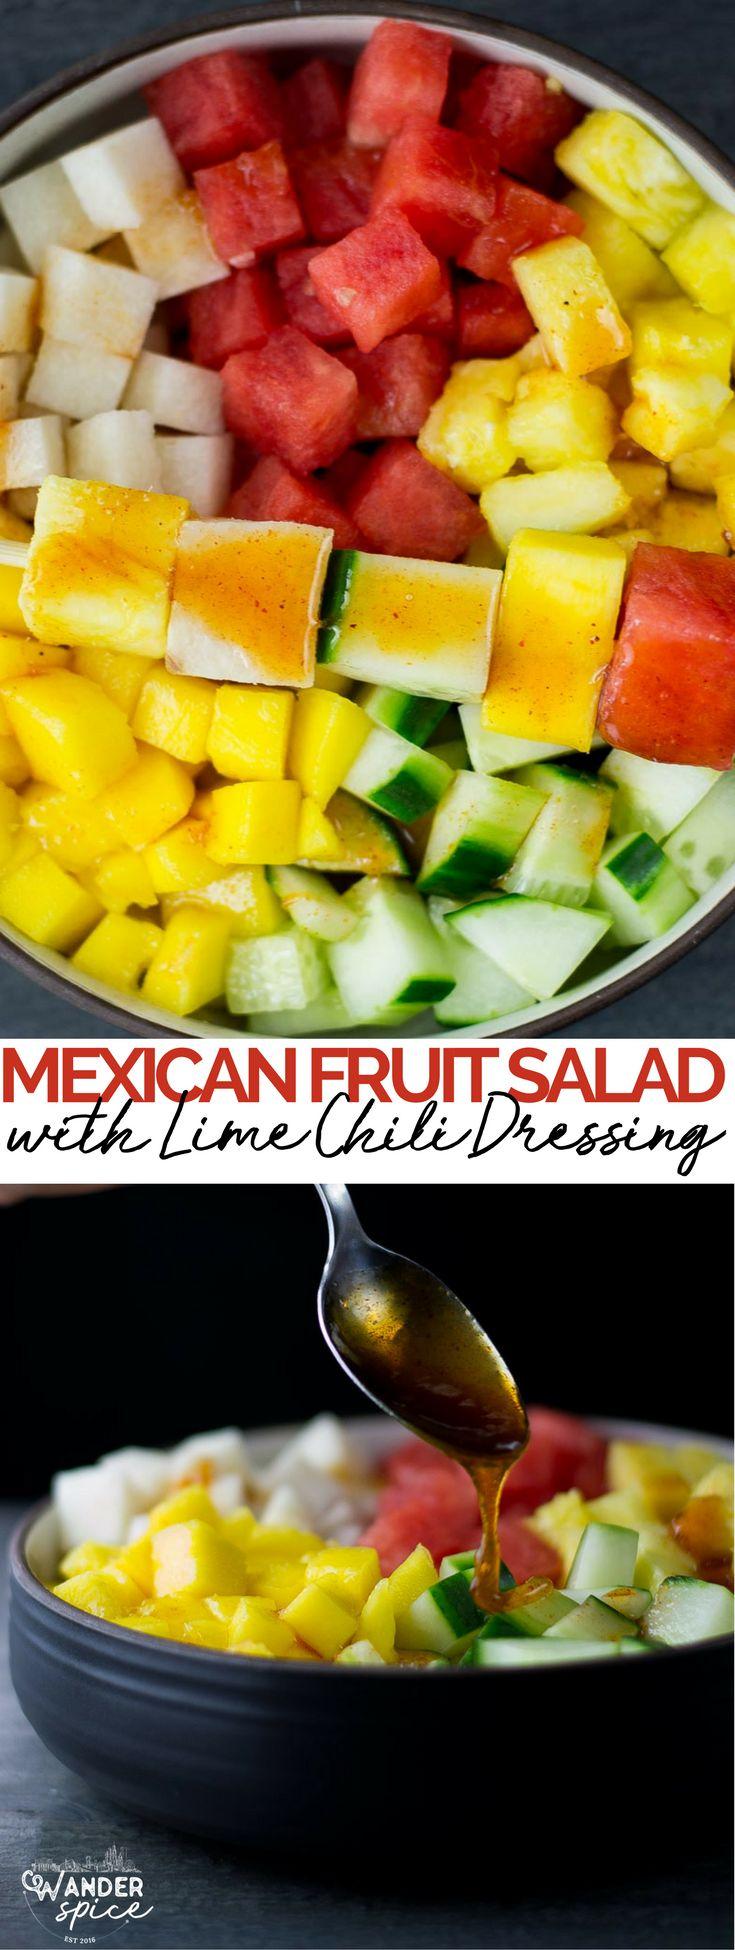 mexican fruit salad recipe | watermelon | cucumbers | jicama | pineapple | mango | vegan